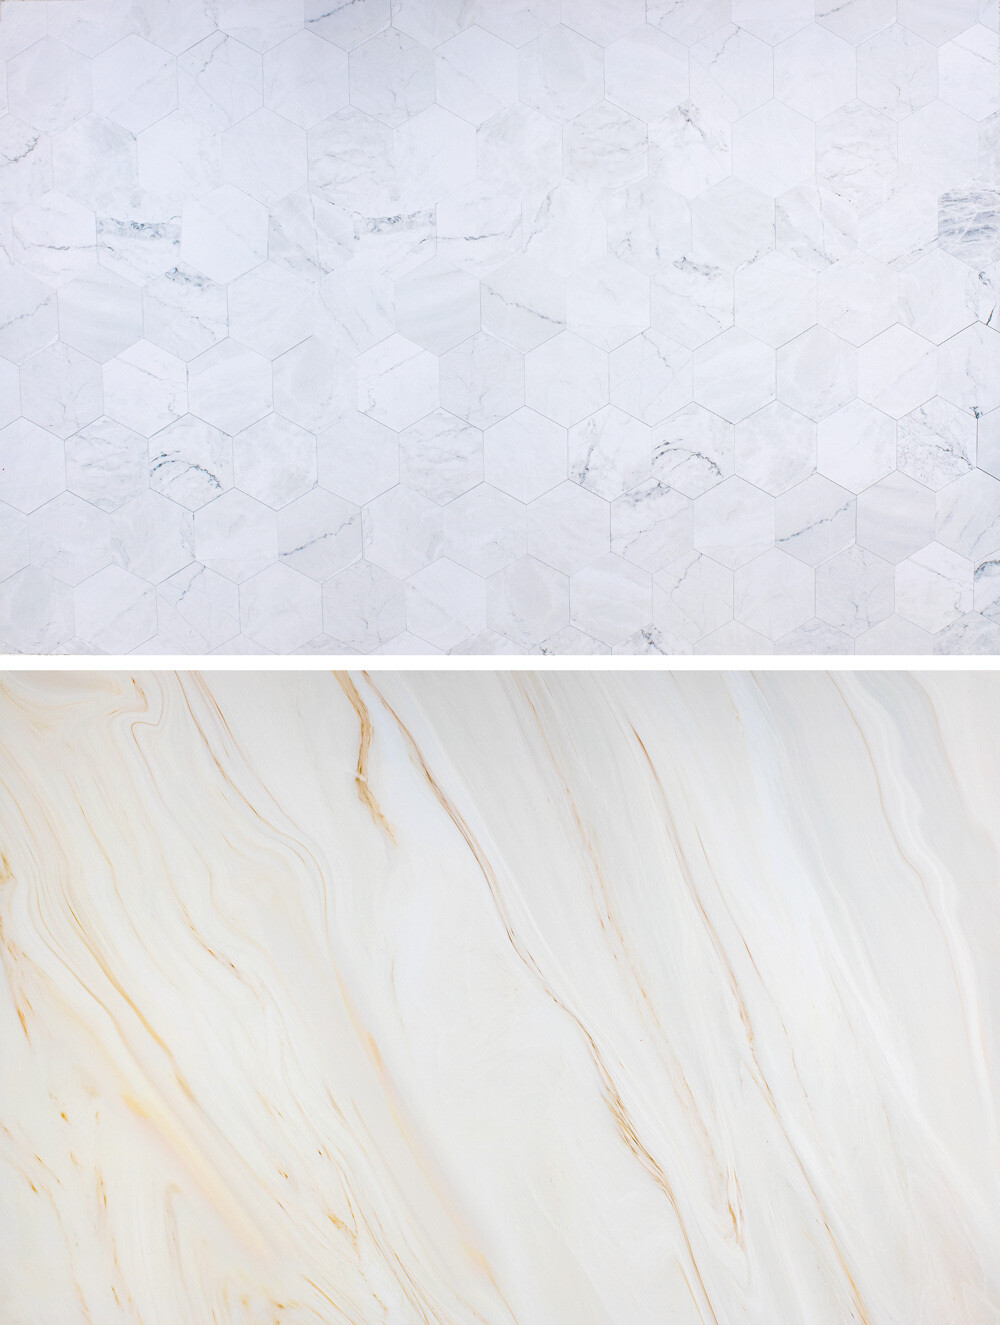 PVC Double Sided Backgrounds 57x87 cm - PVC25